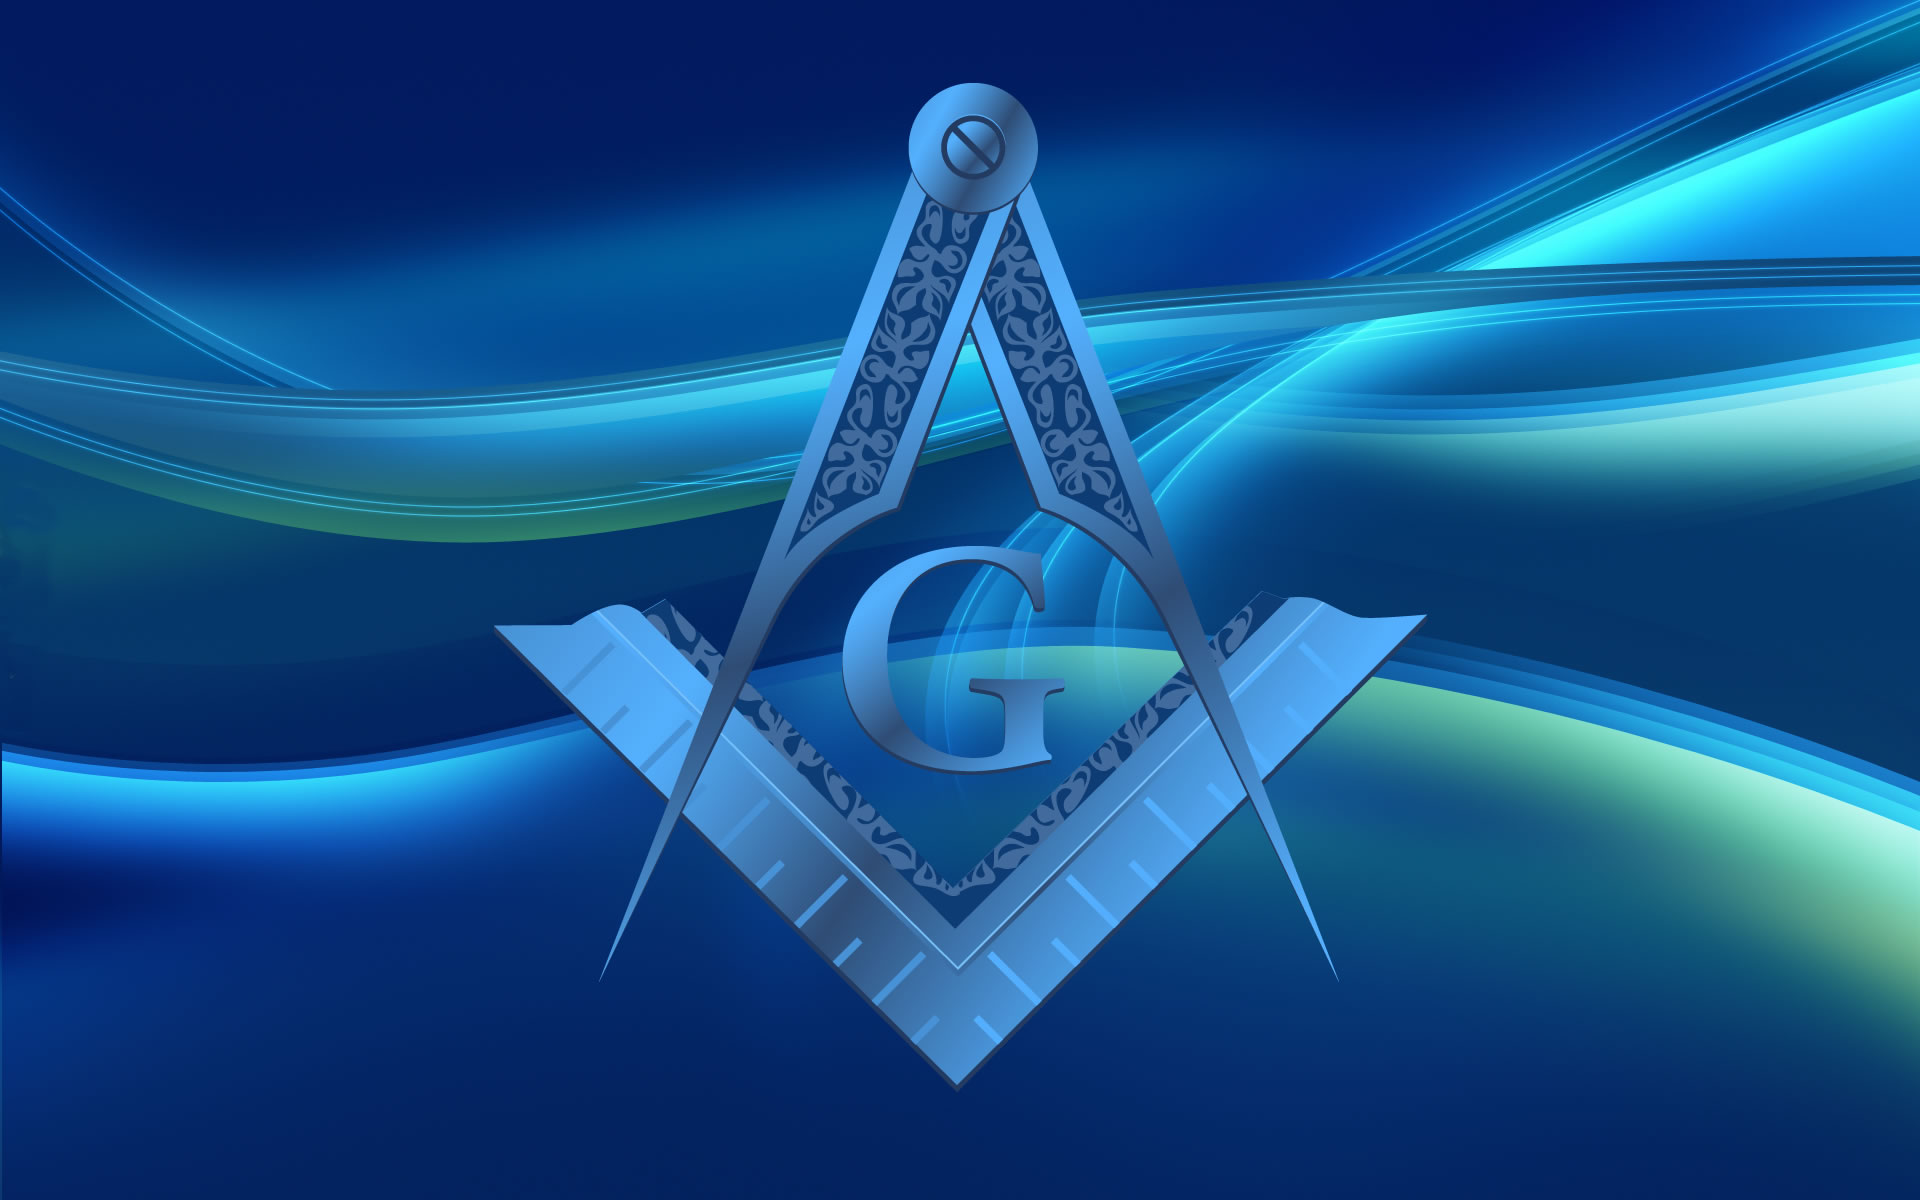 freemason wallpaper Pensacola Lodge 42 F AM 1920x1200